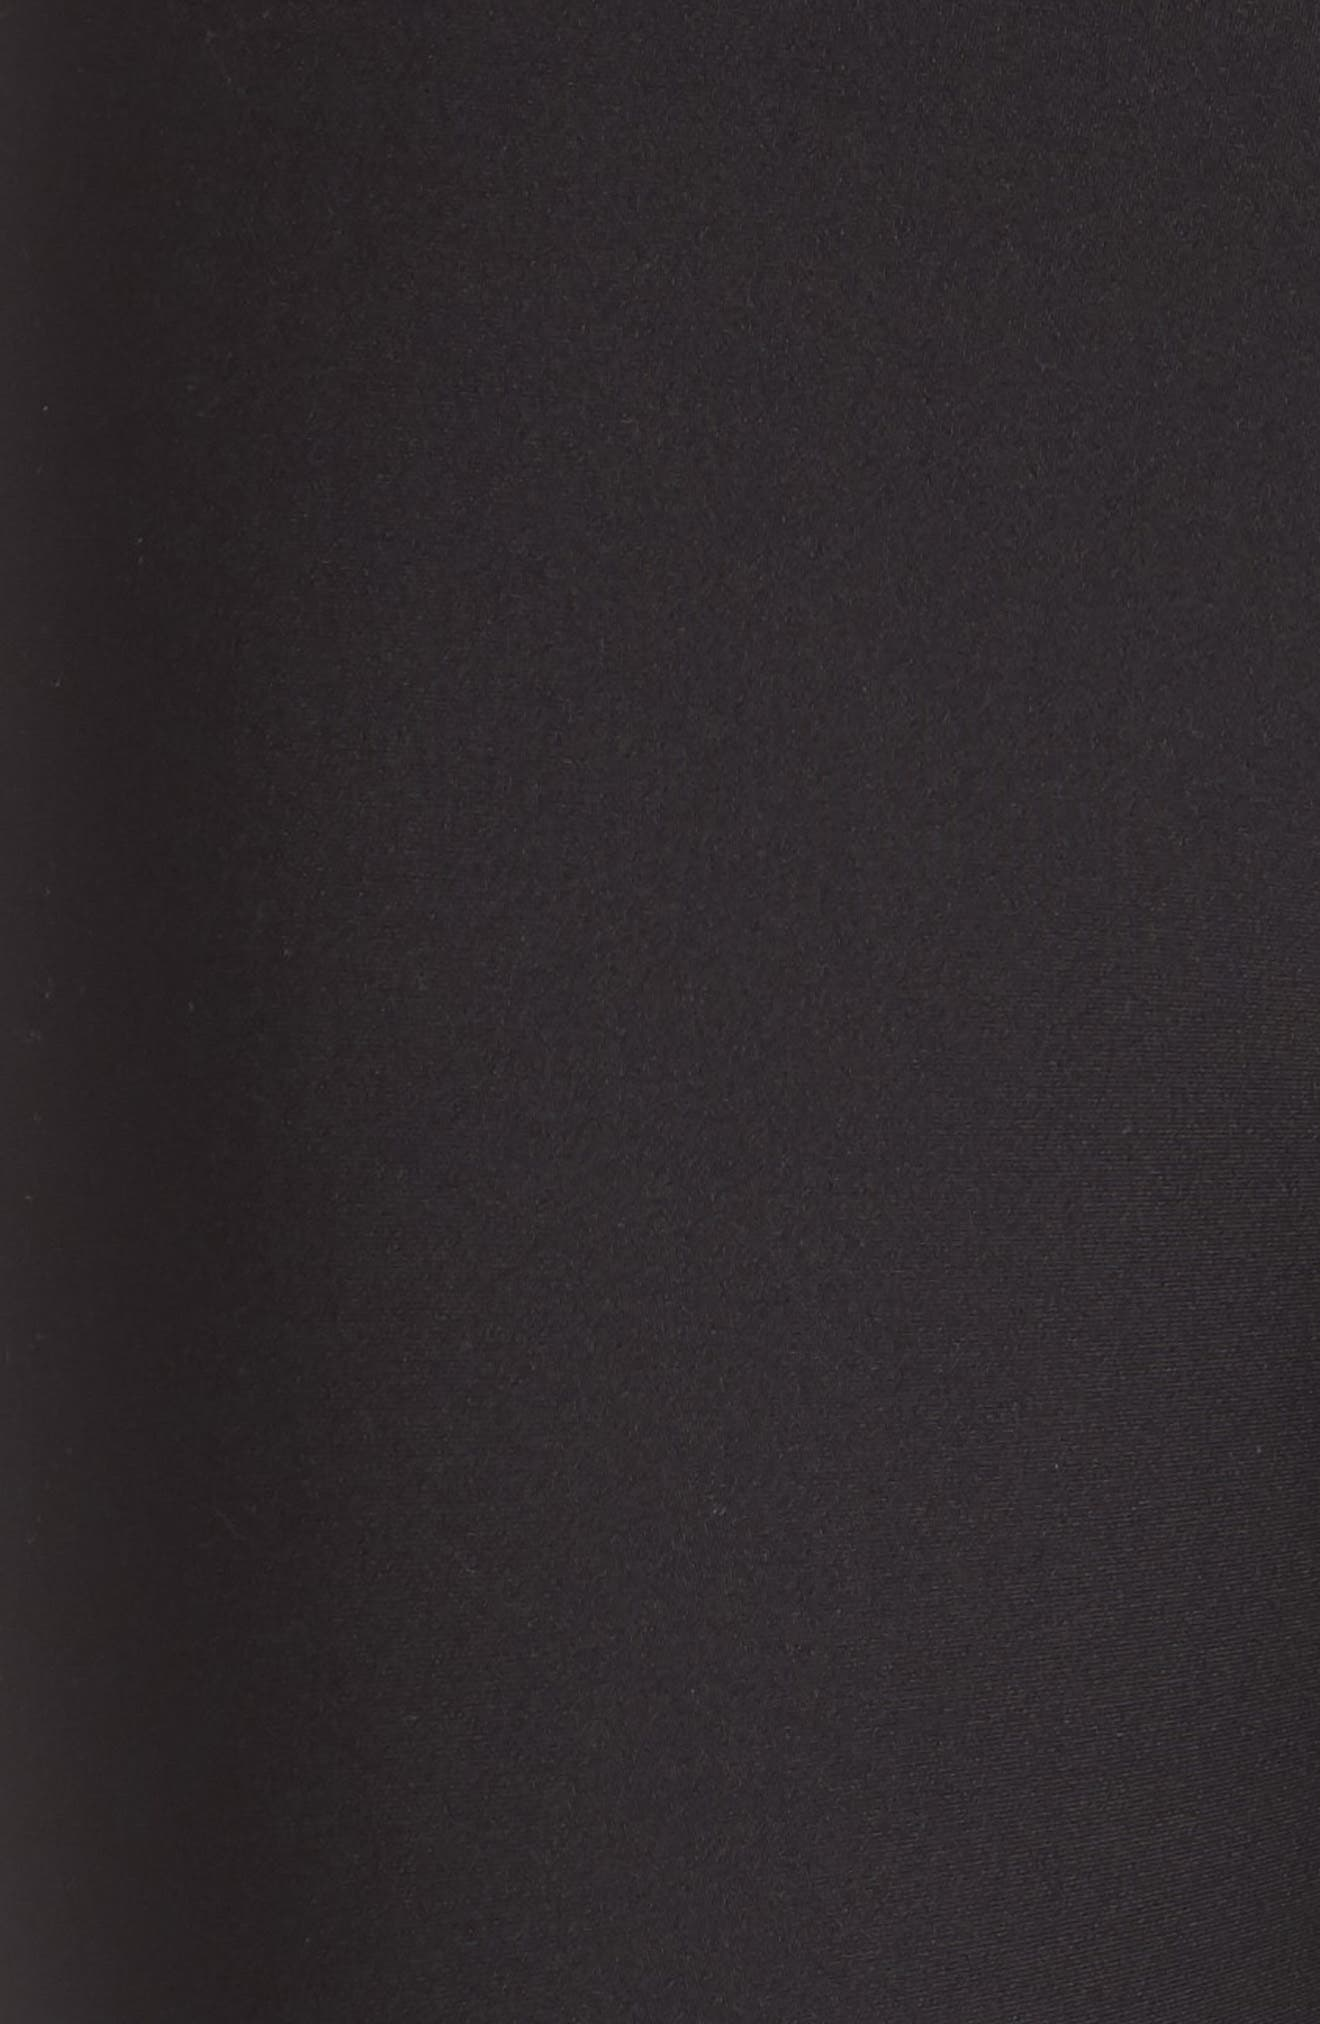 Airbrush Tech Lift High Waist Capris,                             Alternate thumbnail 6, color,                             BLACK